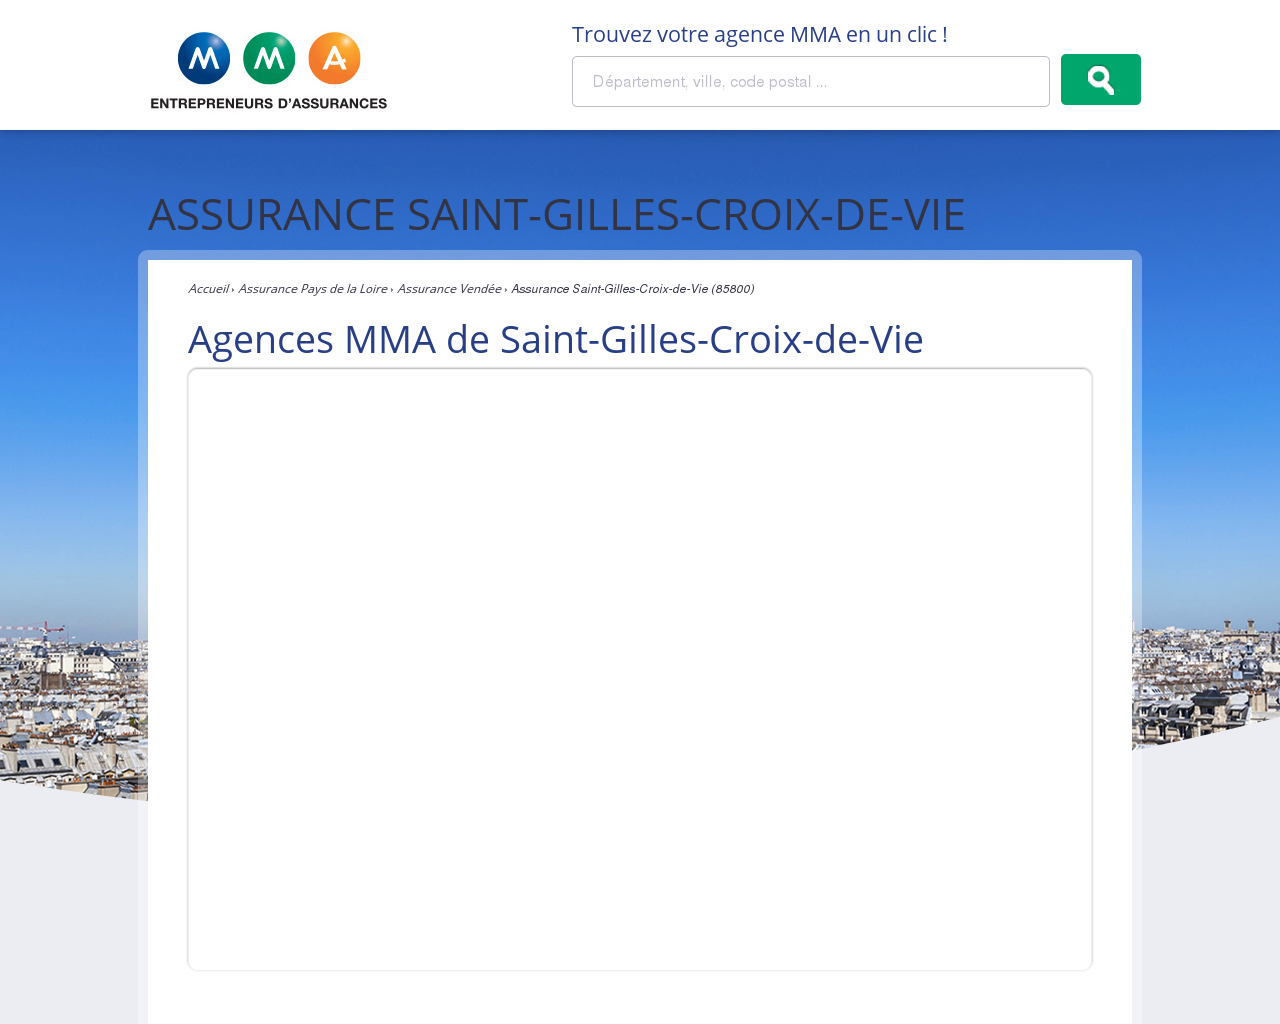 Clic Saint Gilles Croix De Vie mma iard assurances mutuelles gilles